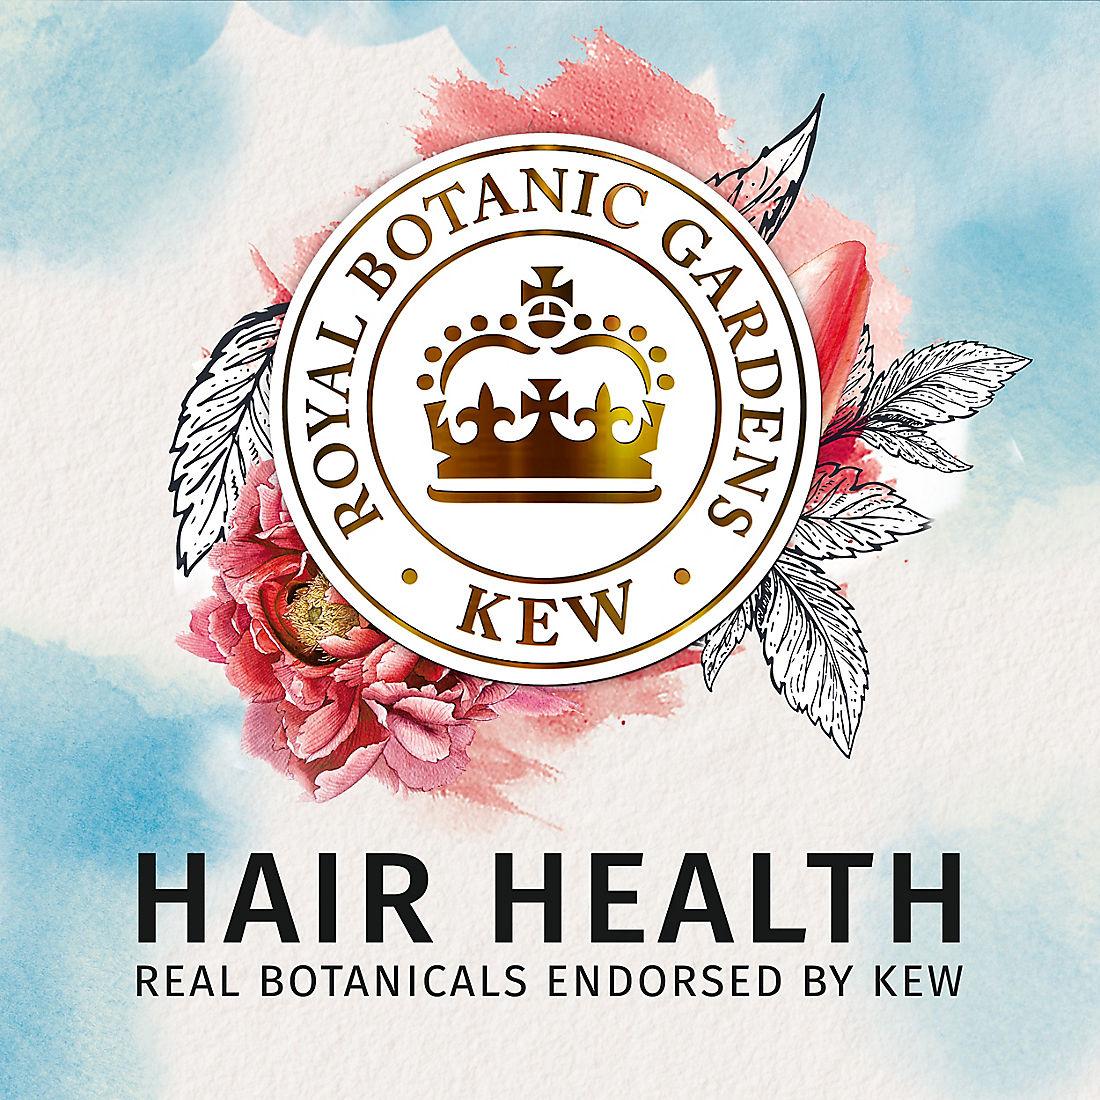 graphic about Herbal Essences Coupons Printable named Natural Essences bio:renew Argan Oil of Morocco Shampoo, 29.2 fl. oz.